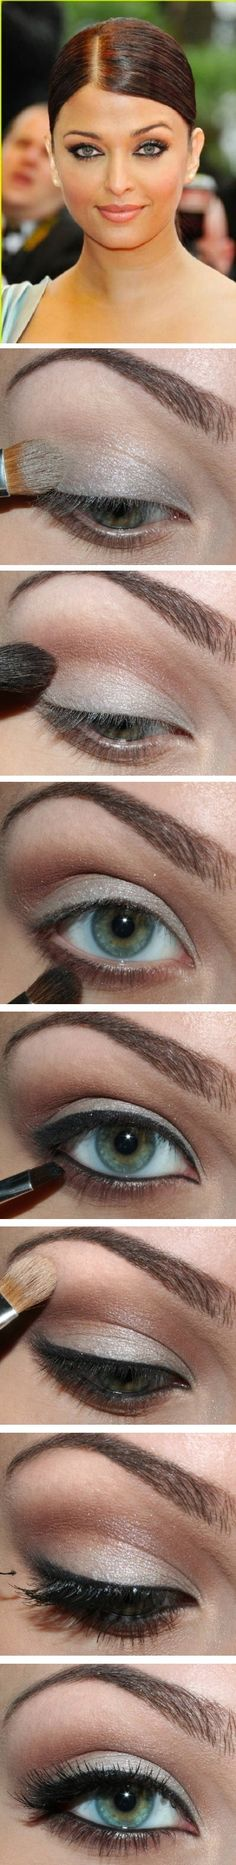 Aishwarya Rai eye makeup #makeup #beauty #cosmetics